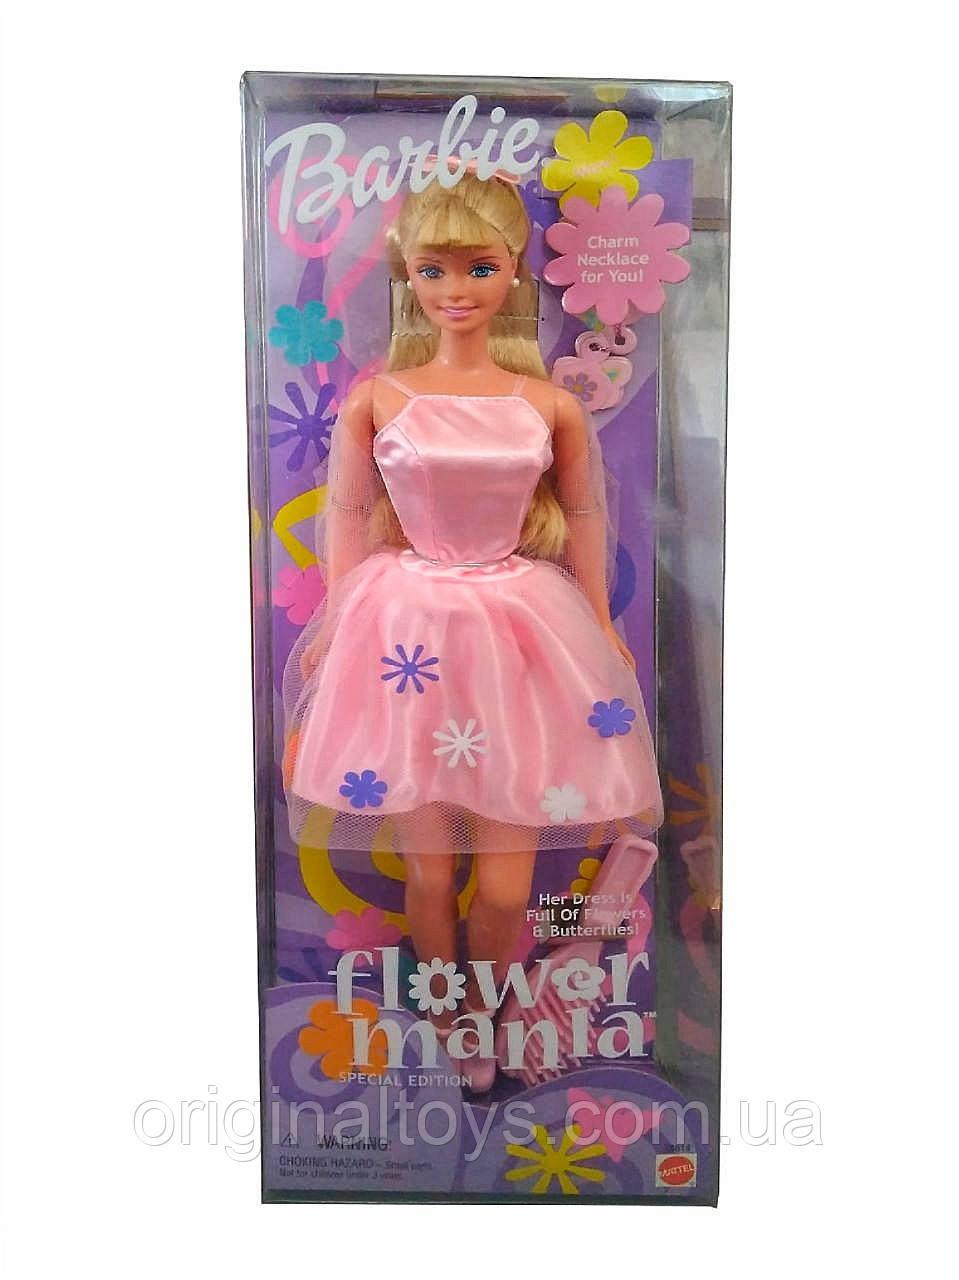 Коллекционная кукла Барби Barbie Flower Mania 2000 Special Edition 28614